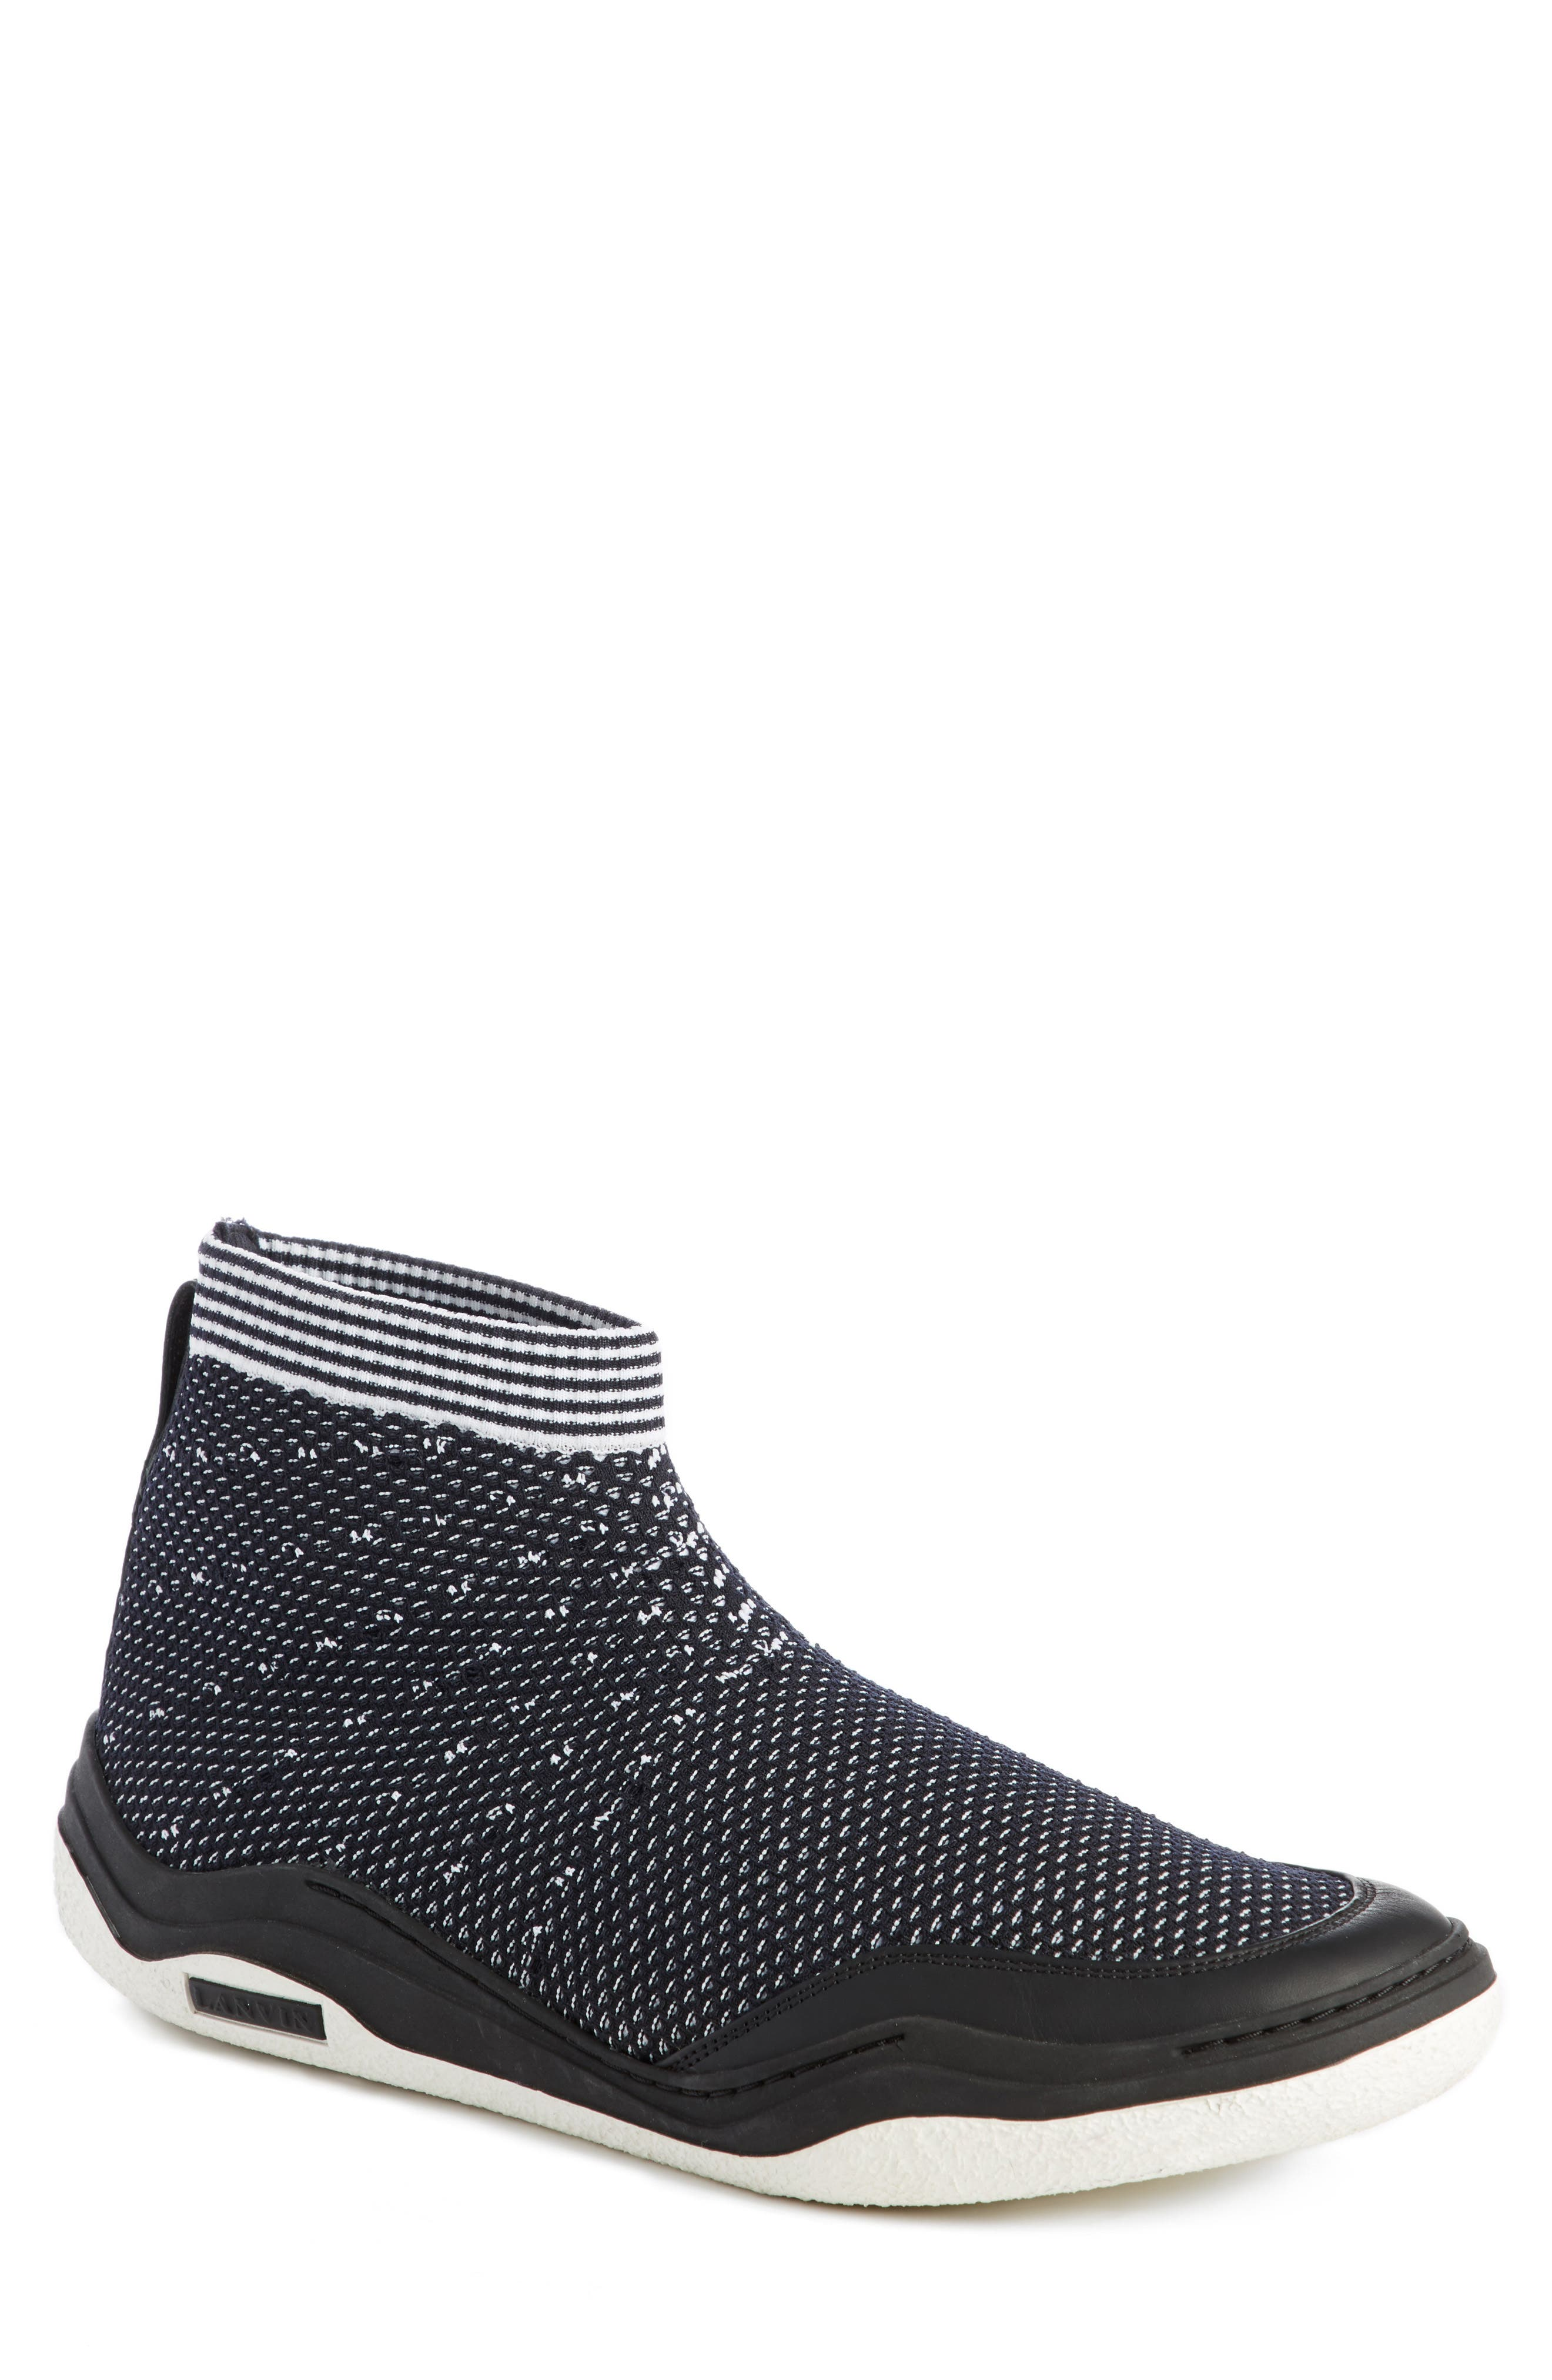 Alternate Image 1 Selected - Lanvin Knit Sneaker (Men)